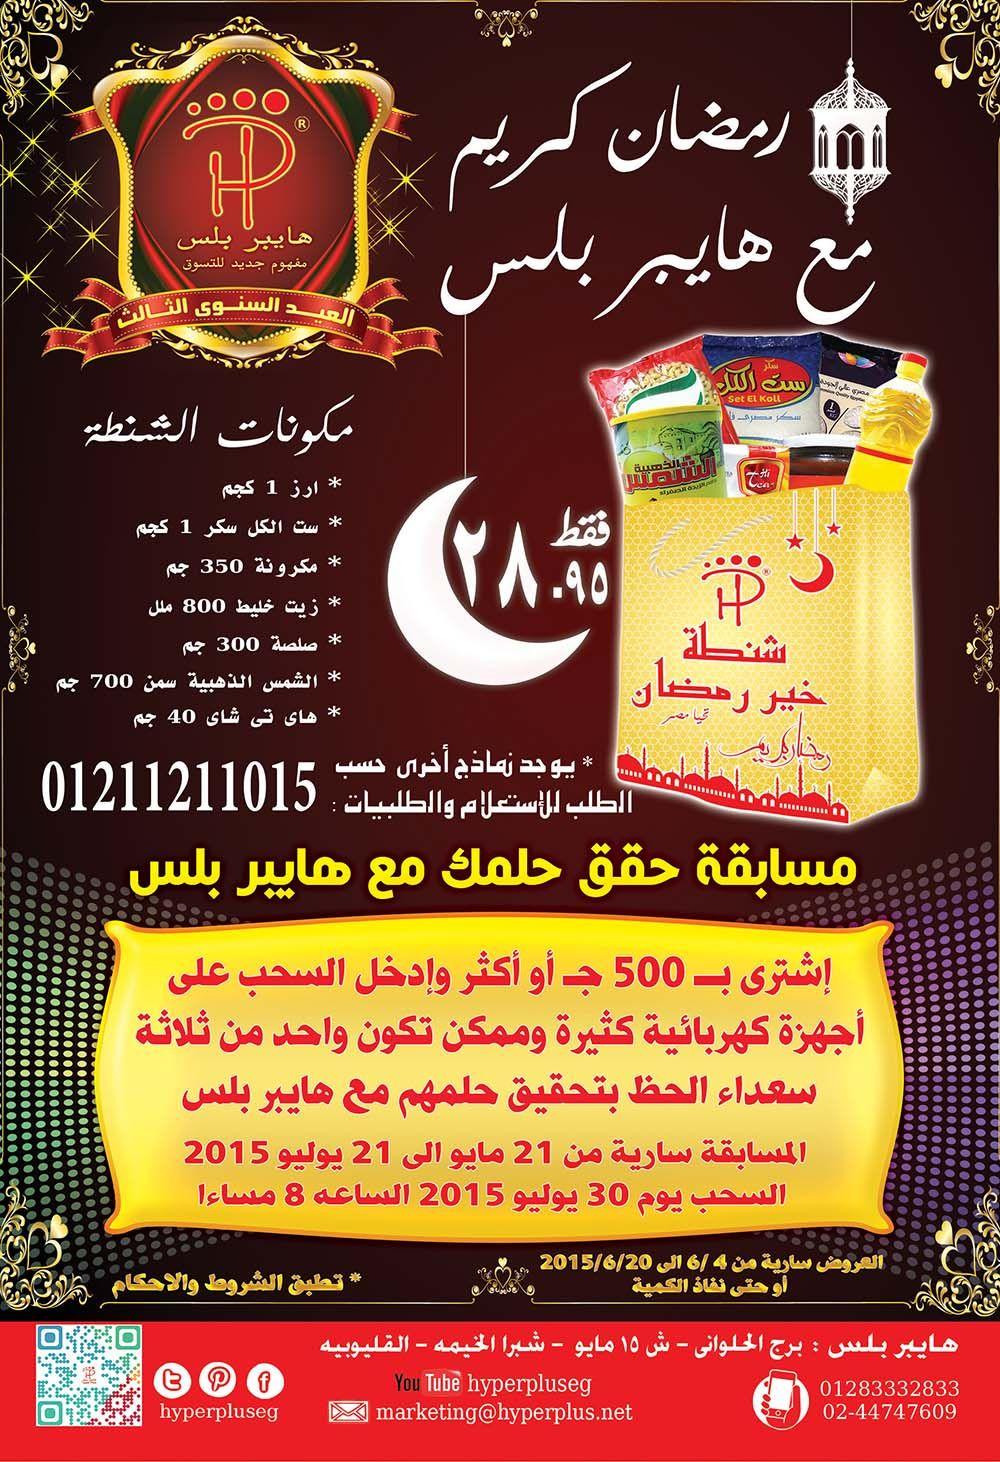 Pin By Hyper Plus On مجلة عروض هايبر بلس لشهر رمضان الكريم 2015 Snack Recipes Snacks Food